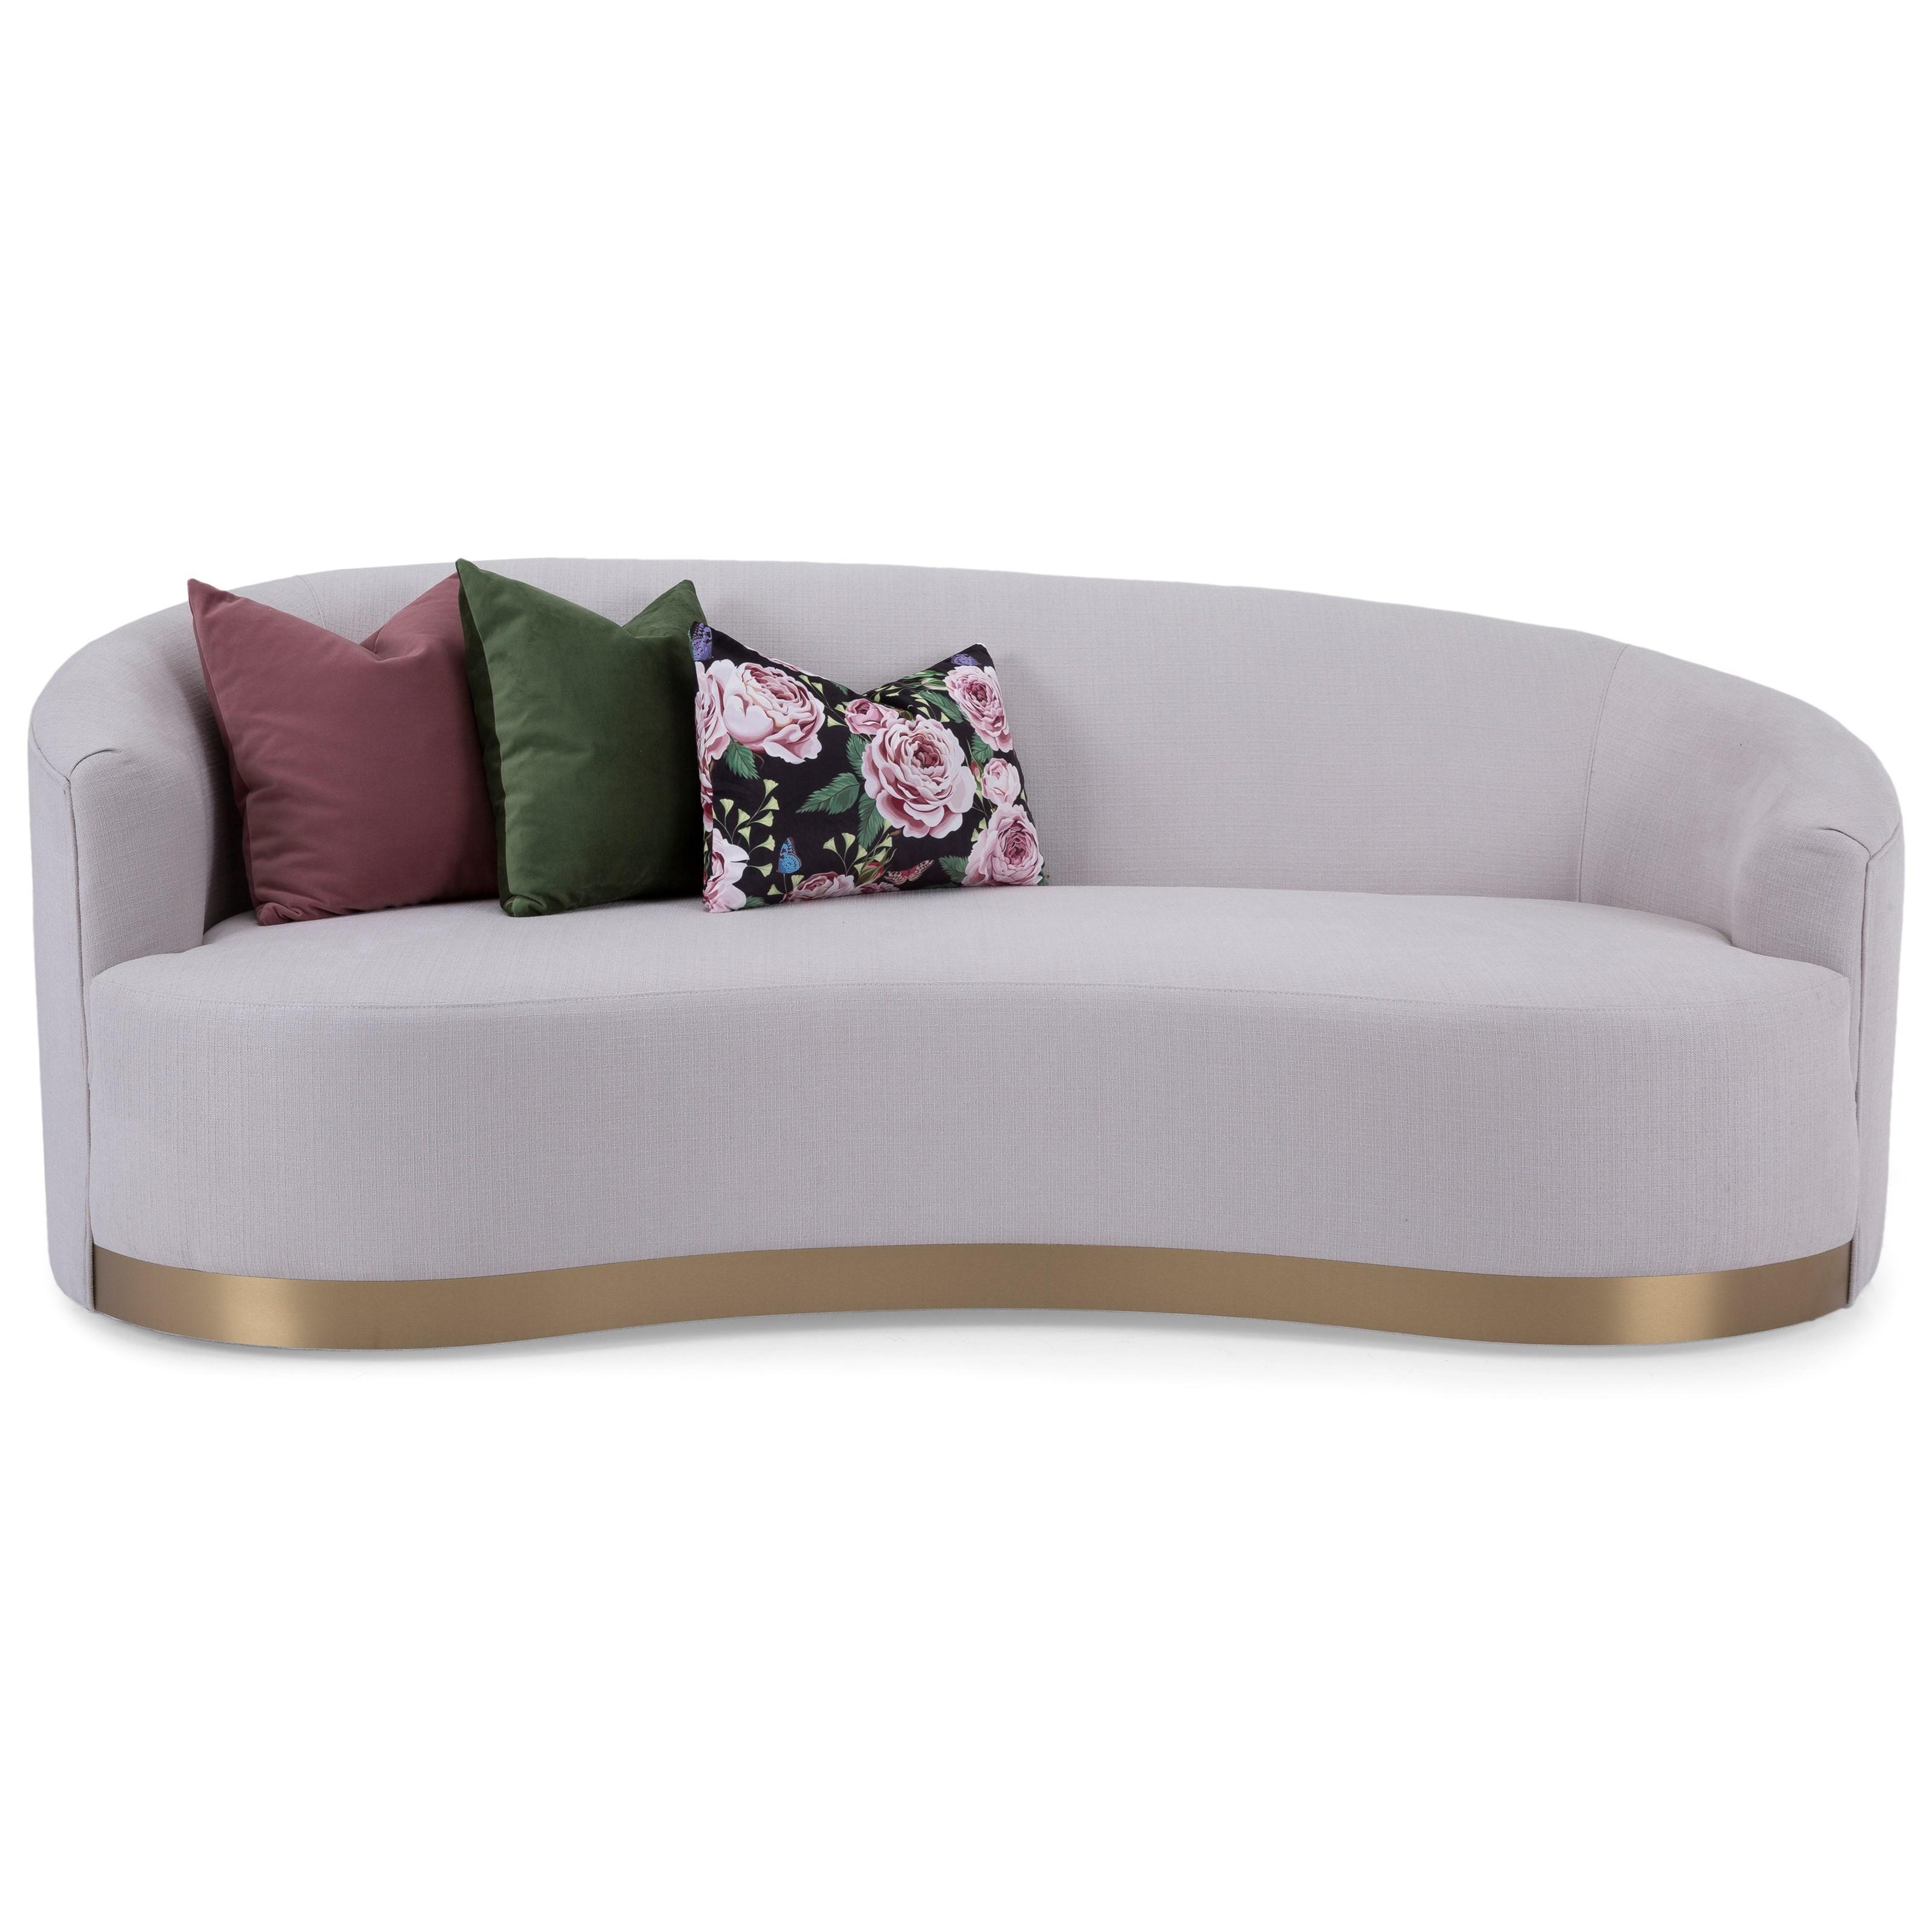 Asymmetrical Kidney Shape Sofa